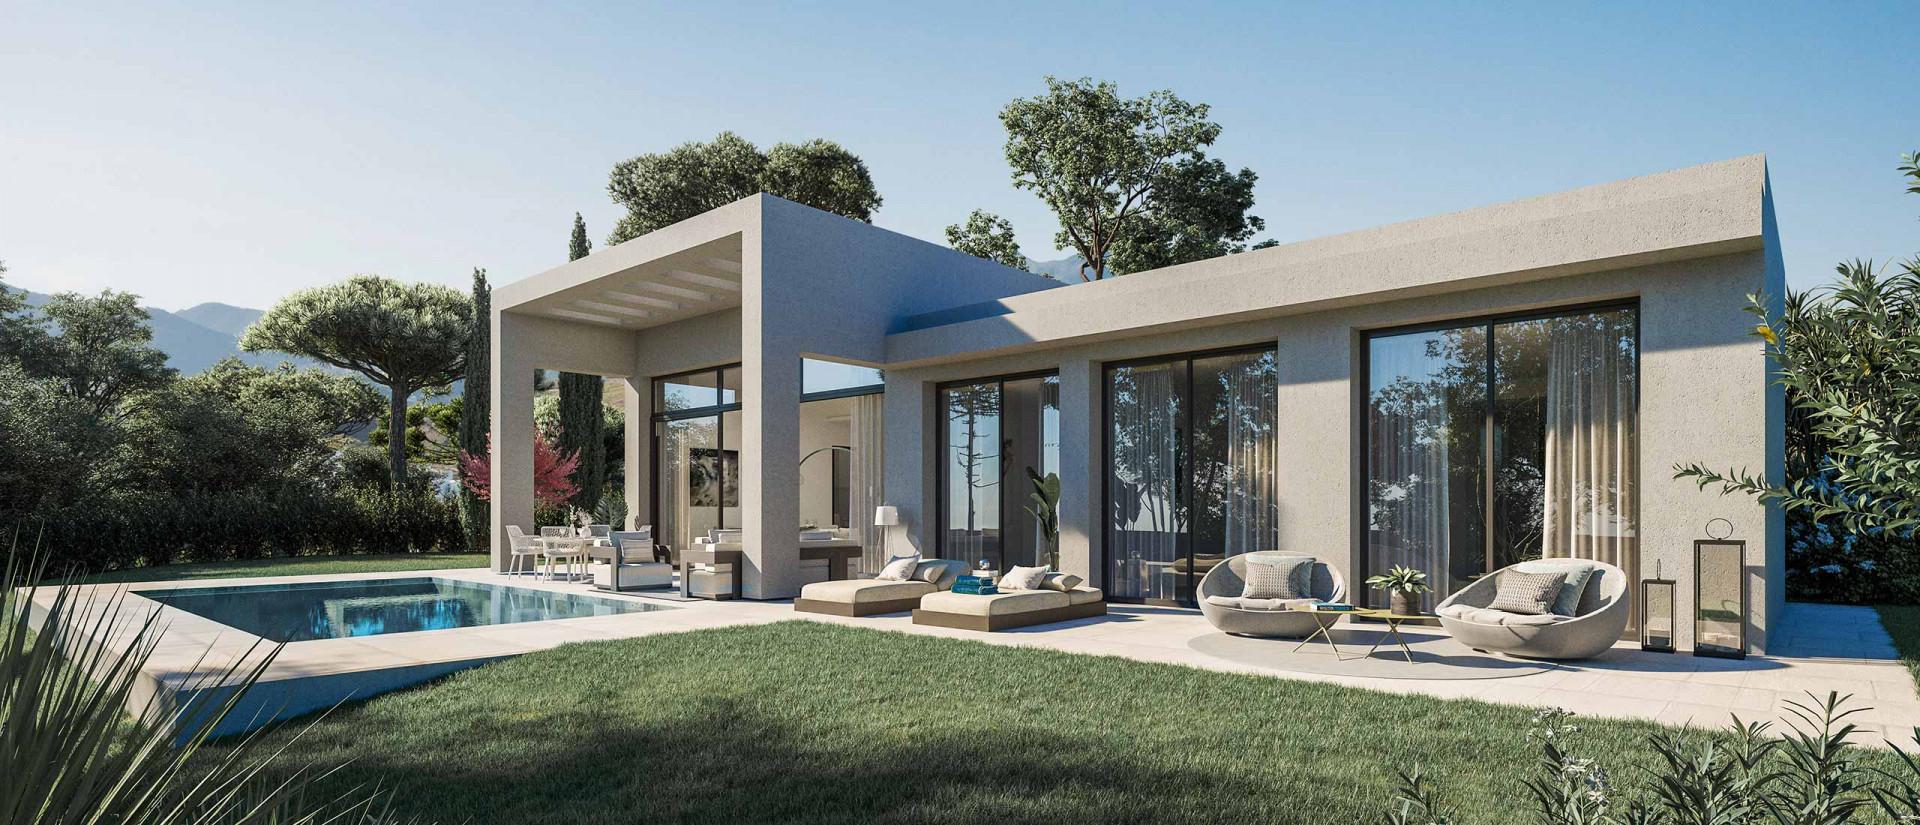 Complex of modern villas for sale in - Benahavis